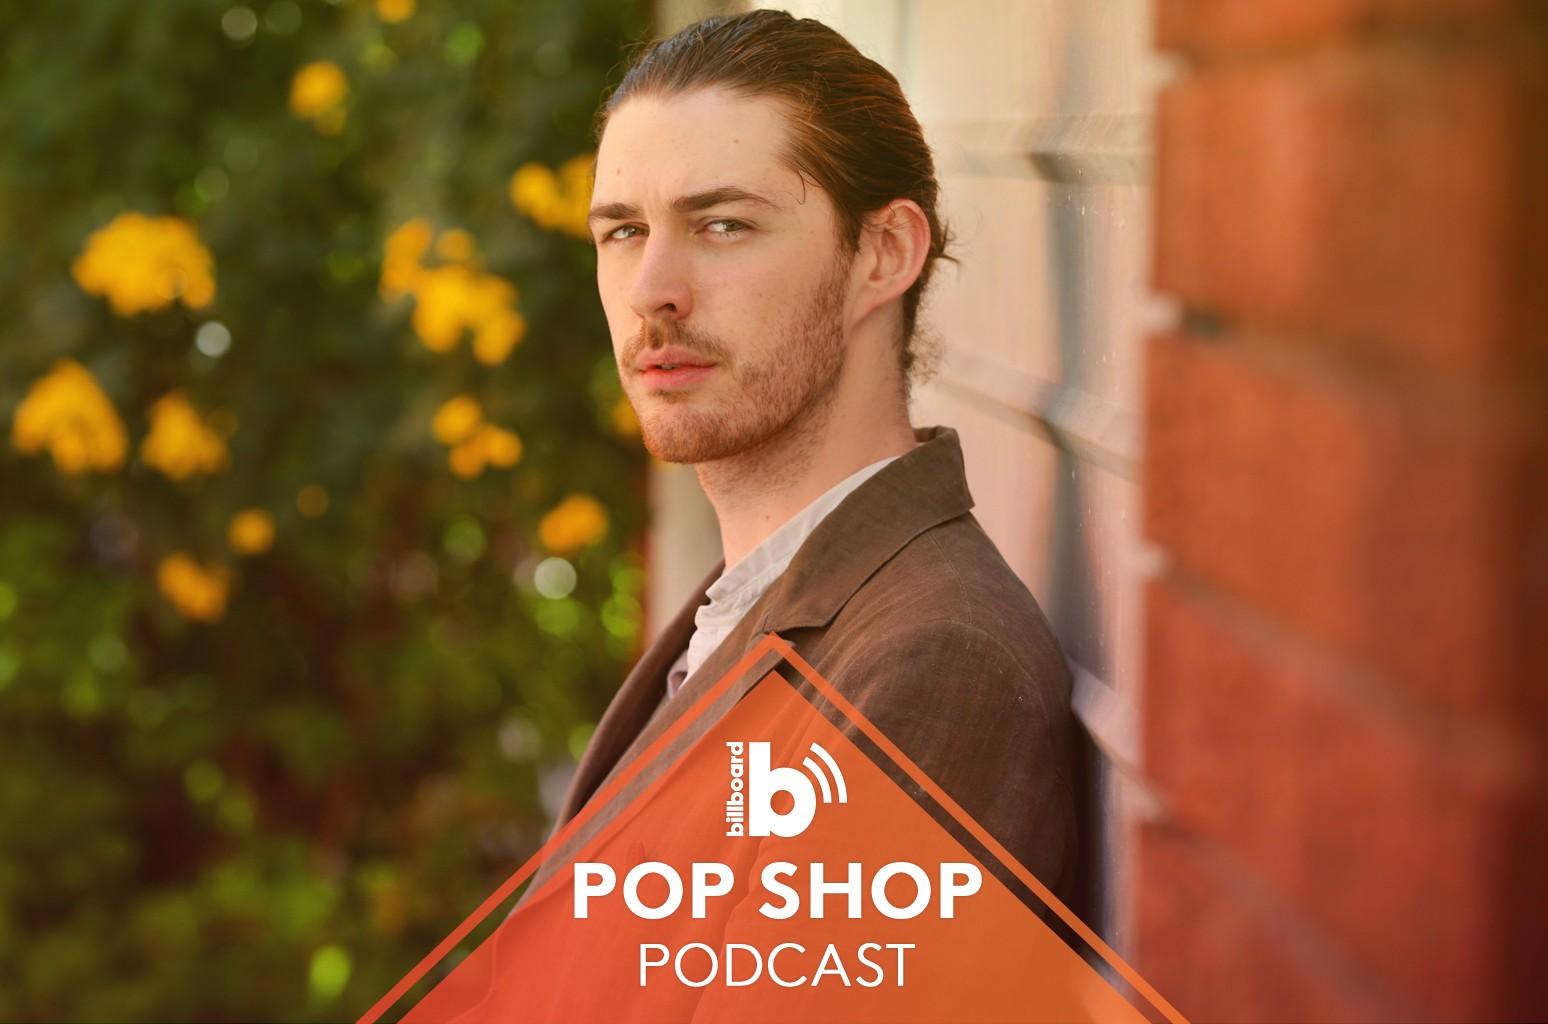 Pop Shop Podcast featuring: Hozier